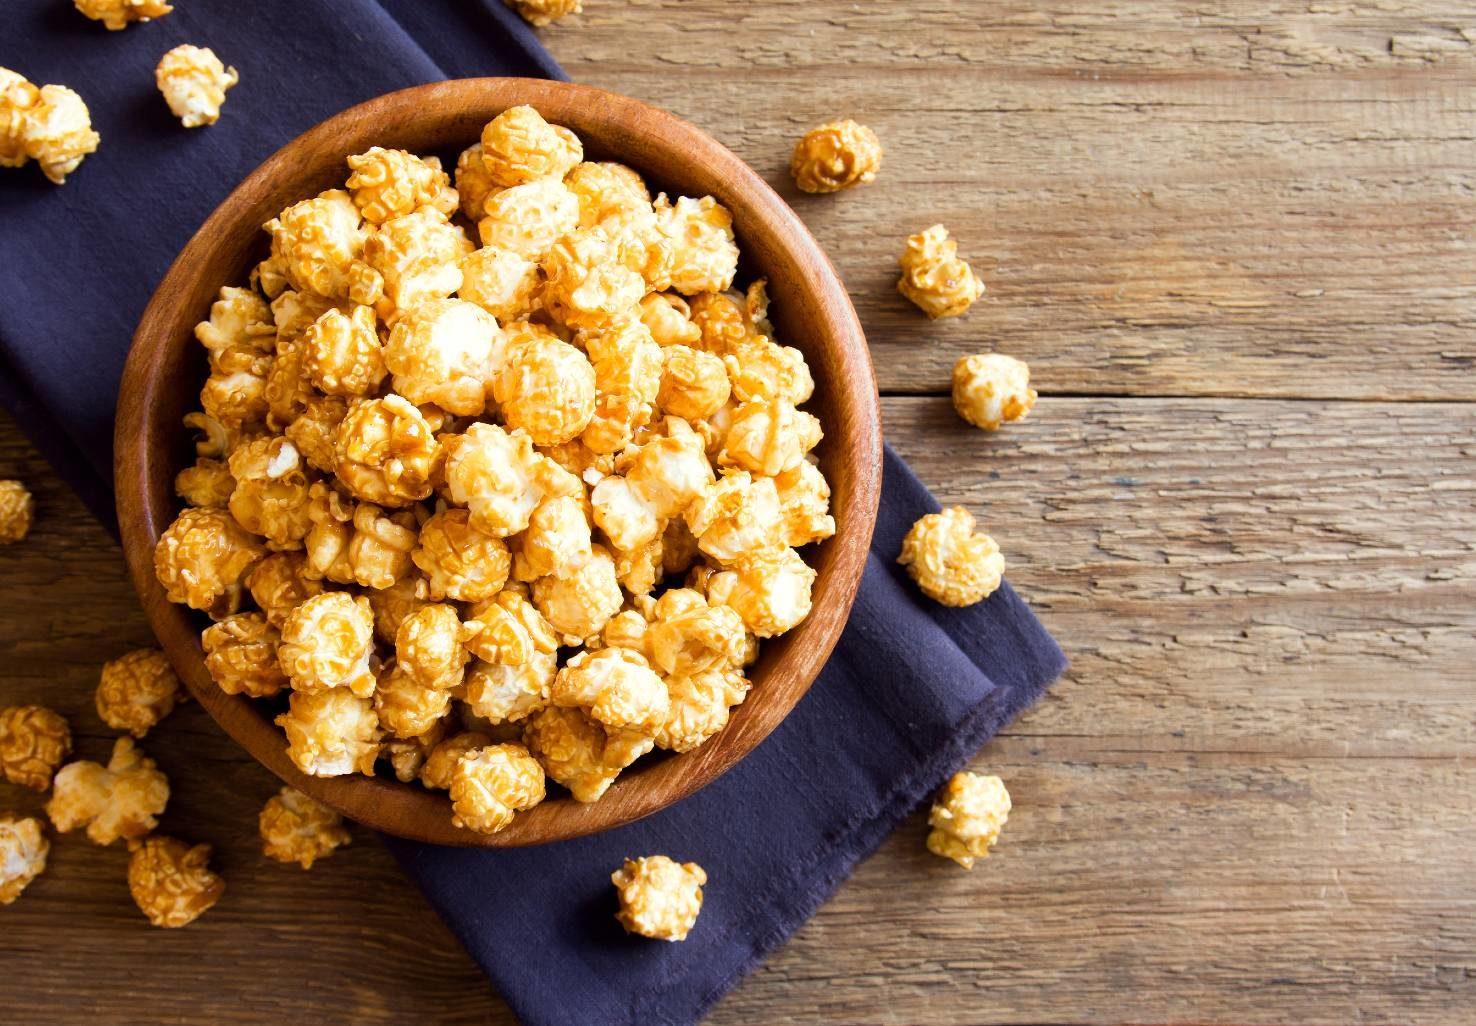 bowl of gourmet popcorn